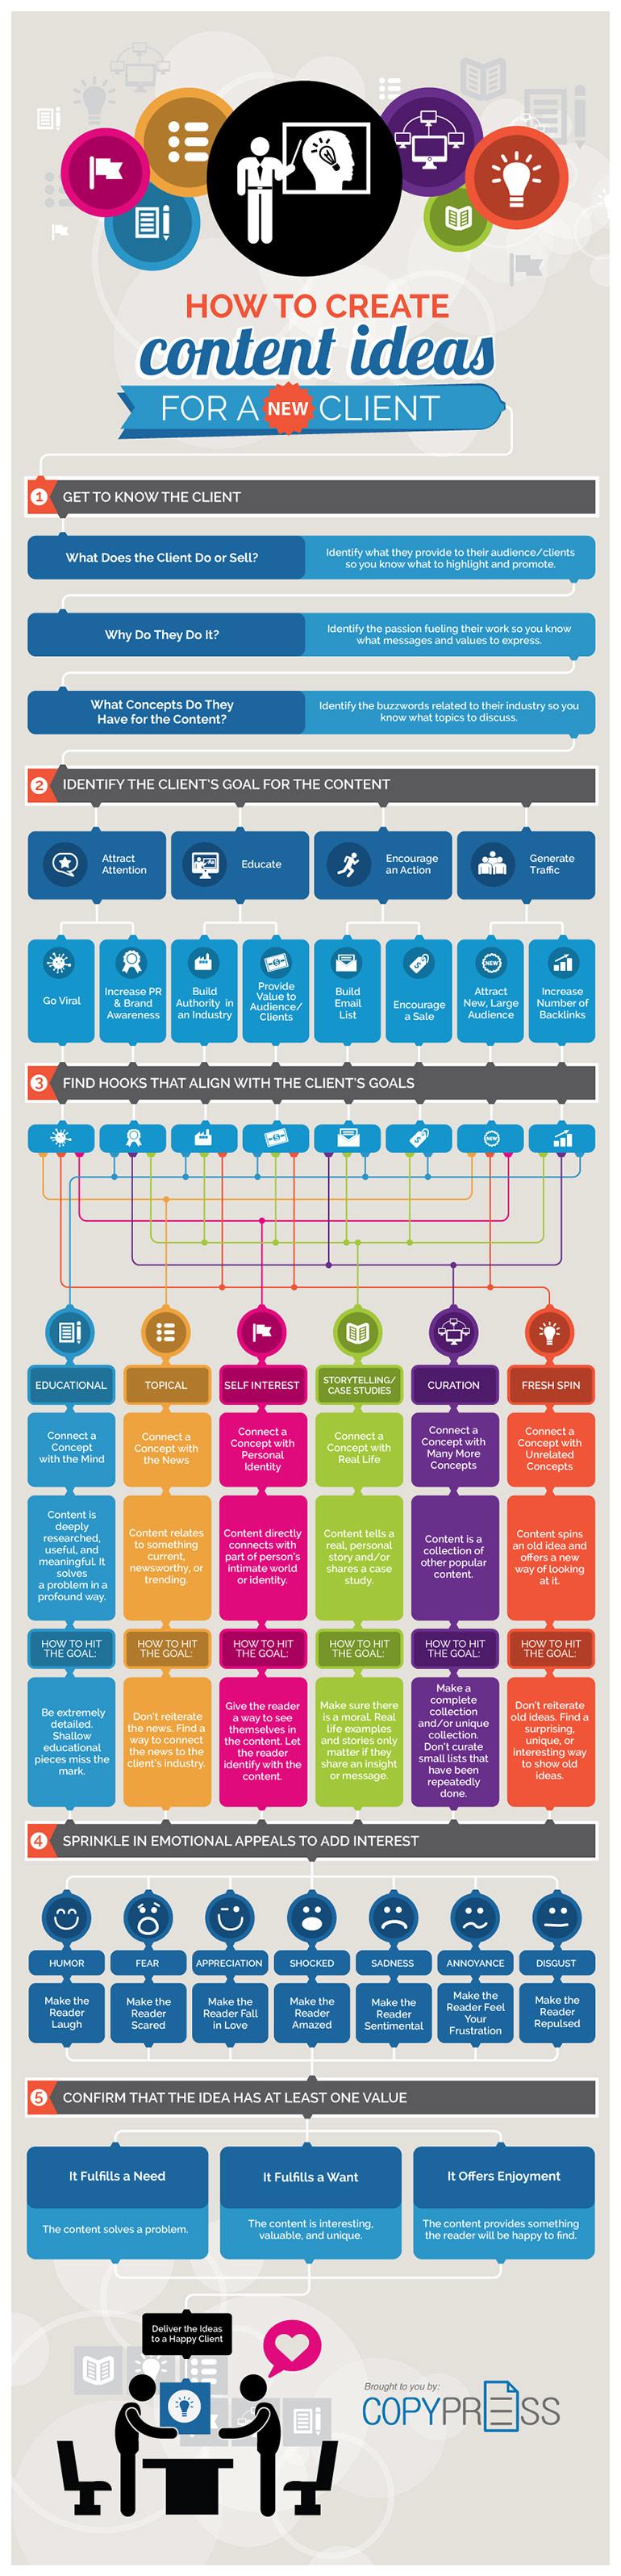 content-marketing-ideen-entwickeln-infografik